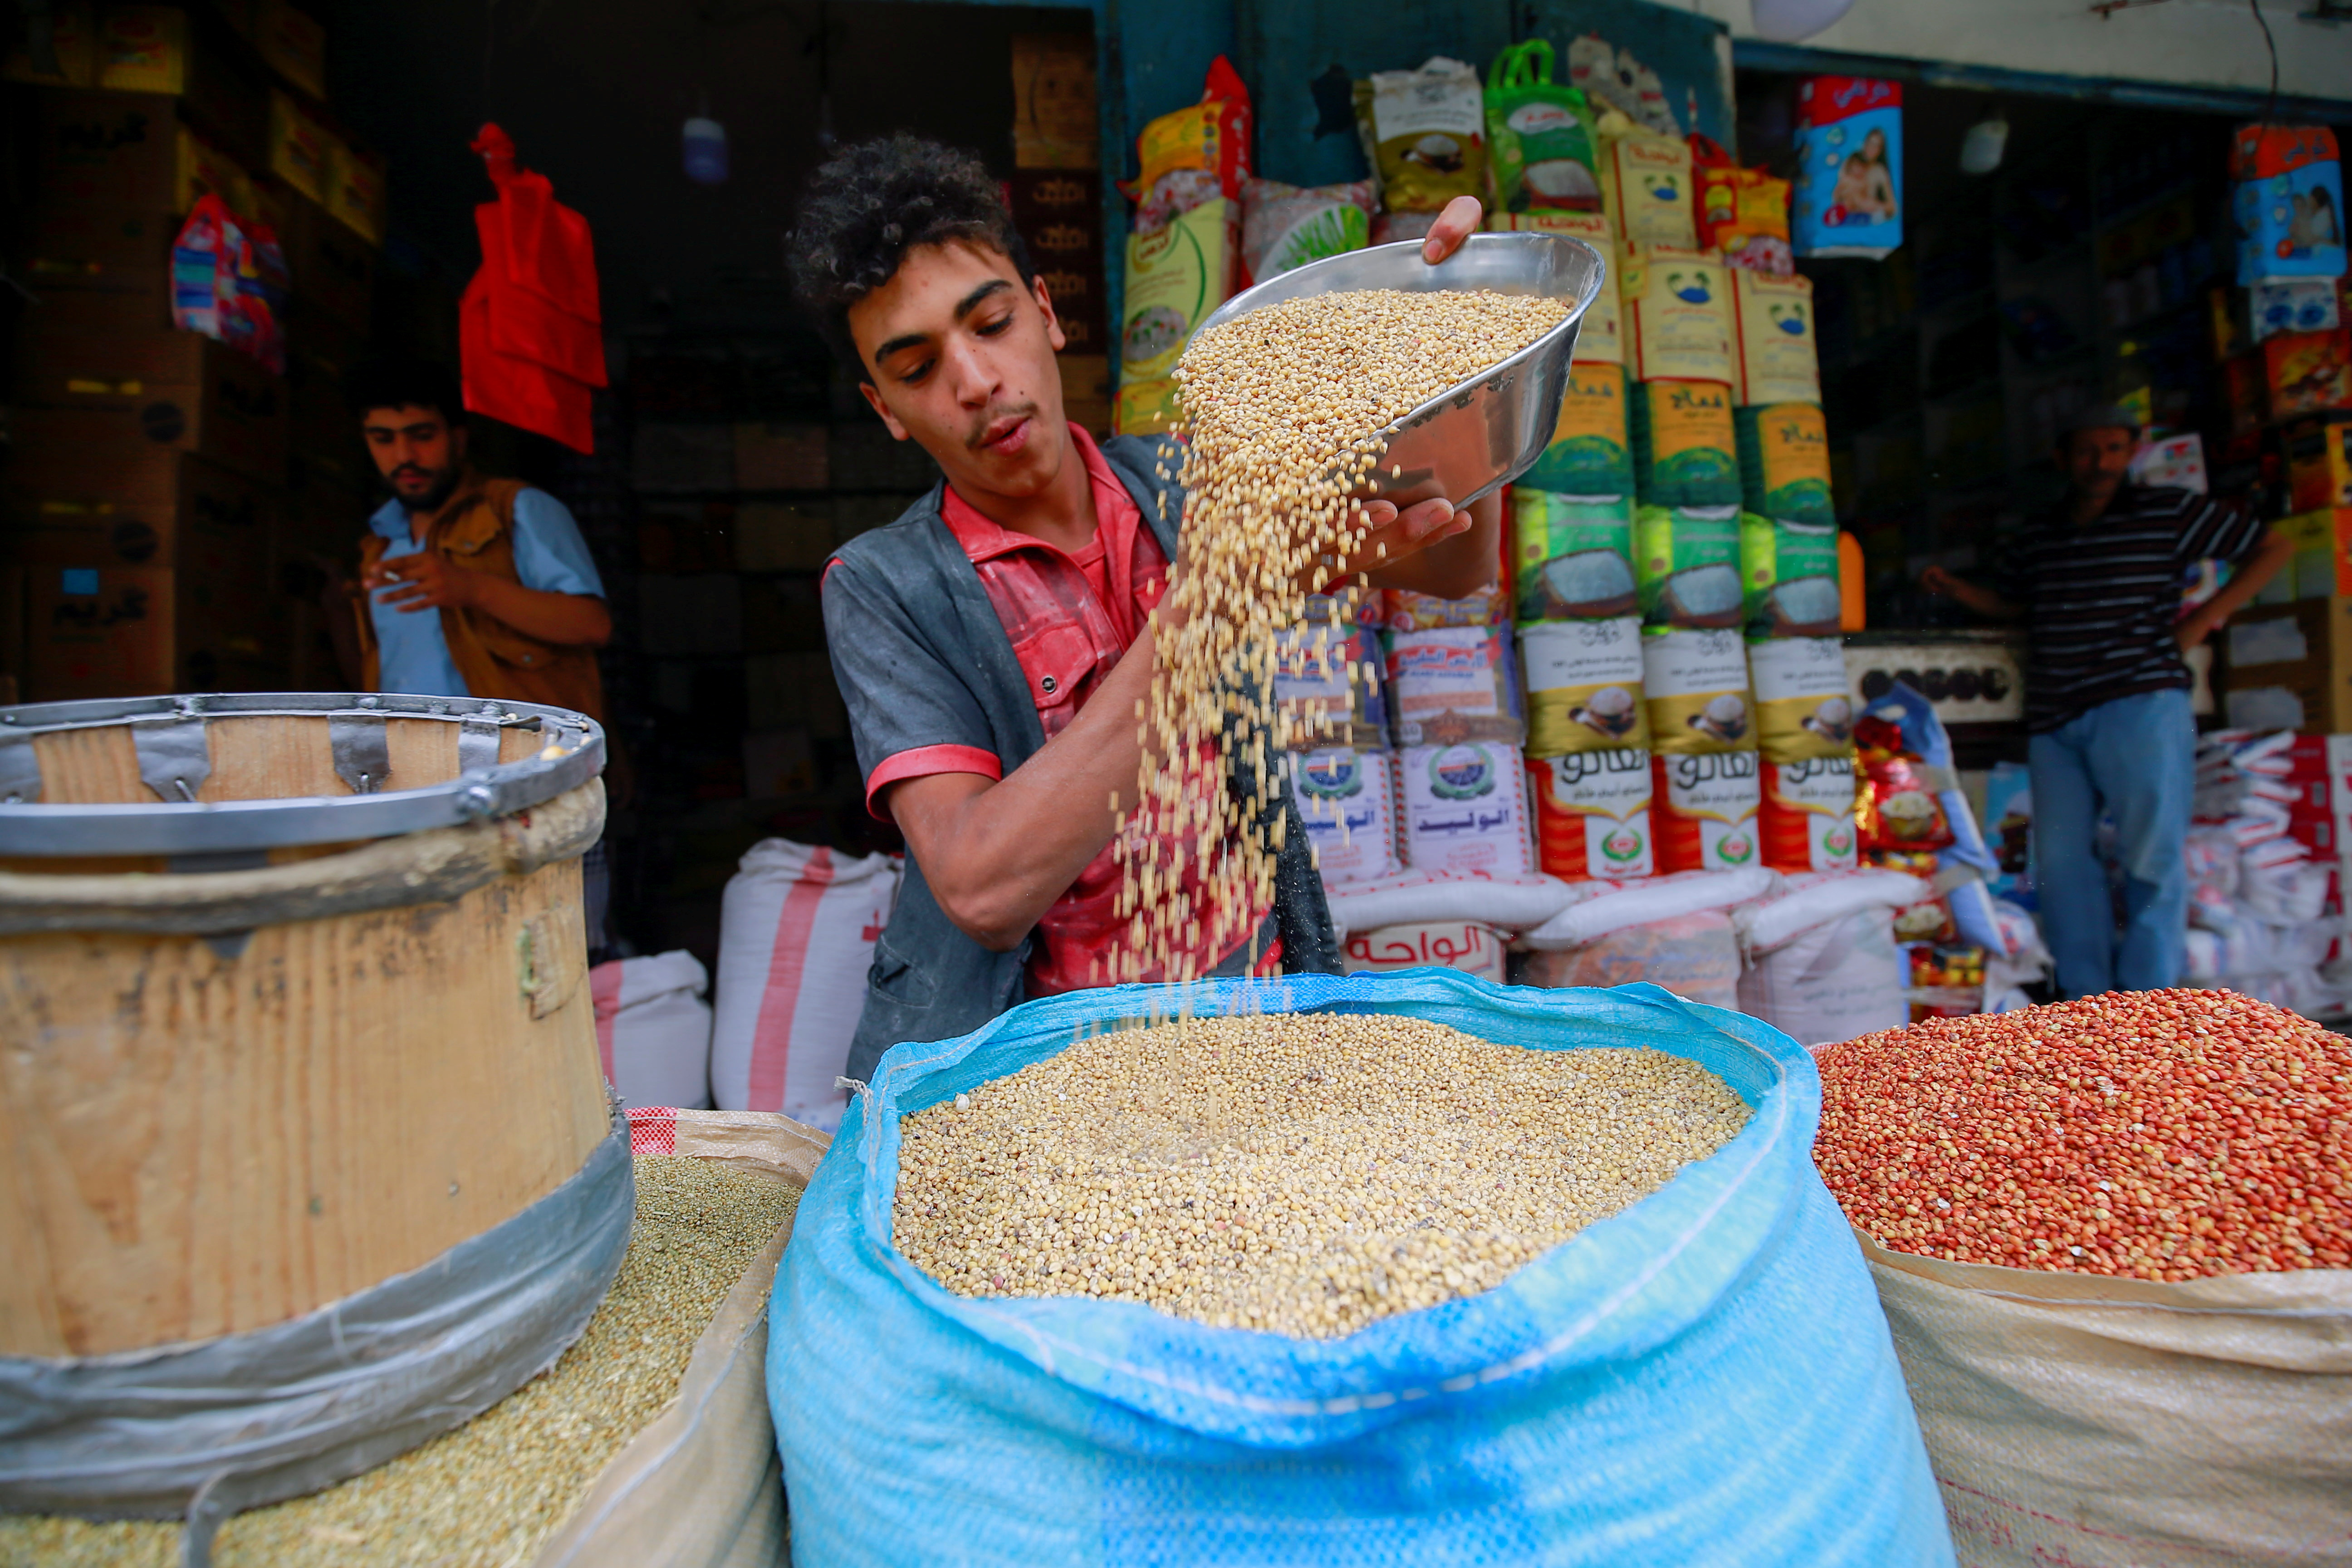 A spices vendor displays grains at his shop in Sanaa, Yemen June 28, 2021. Picture taken June 28, 2021. REUTERS/Nusaibah Almuaalemi